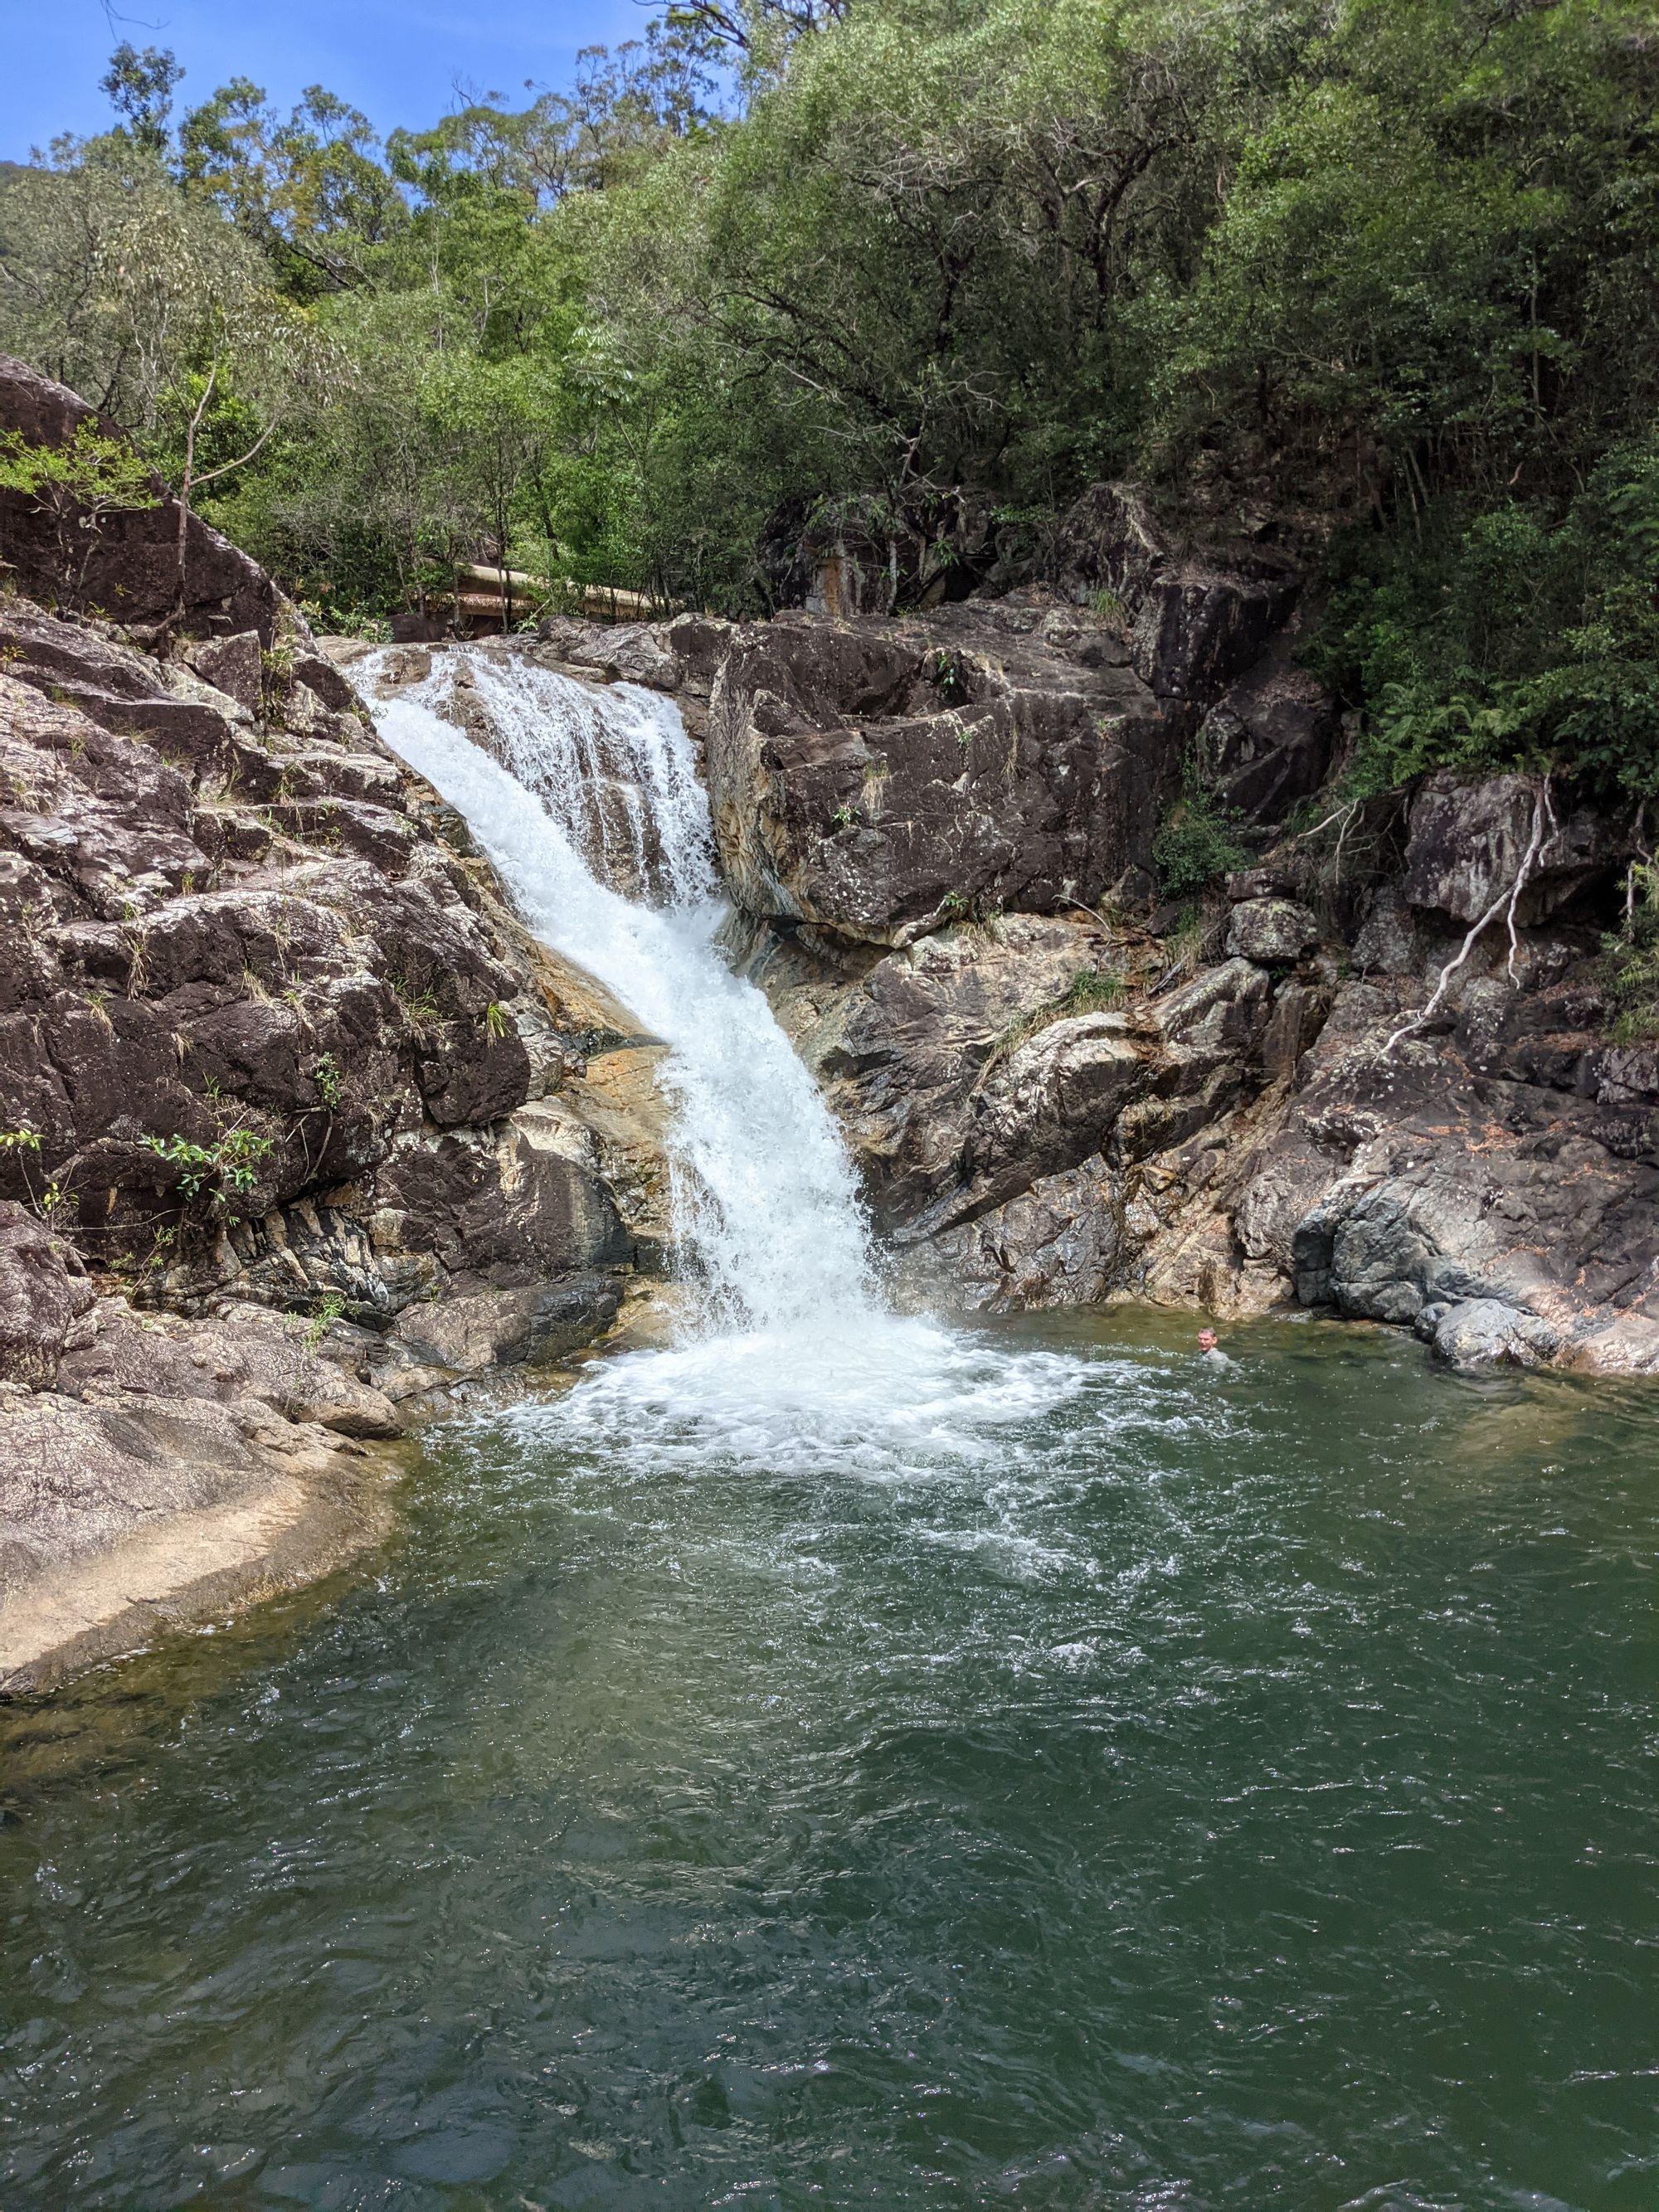 Lower Ethel Creek falls